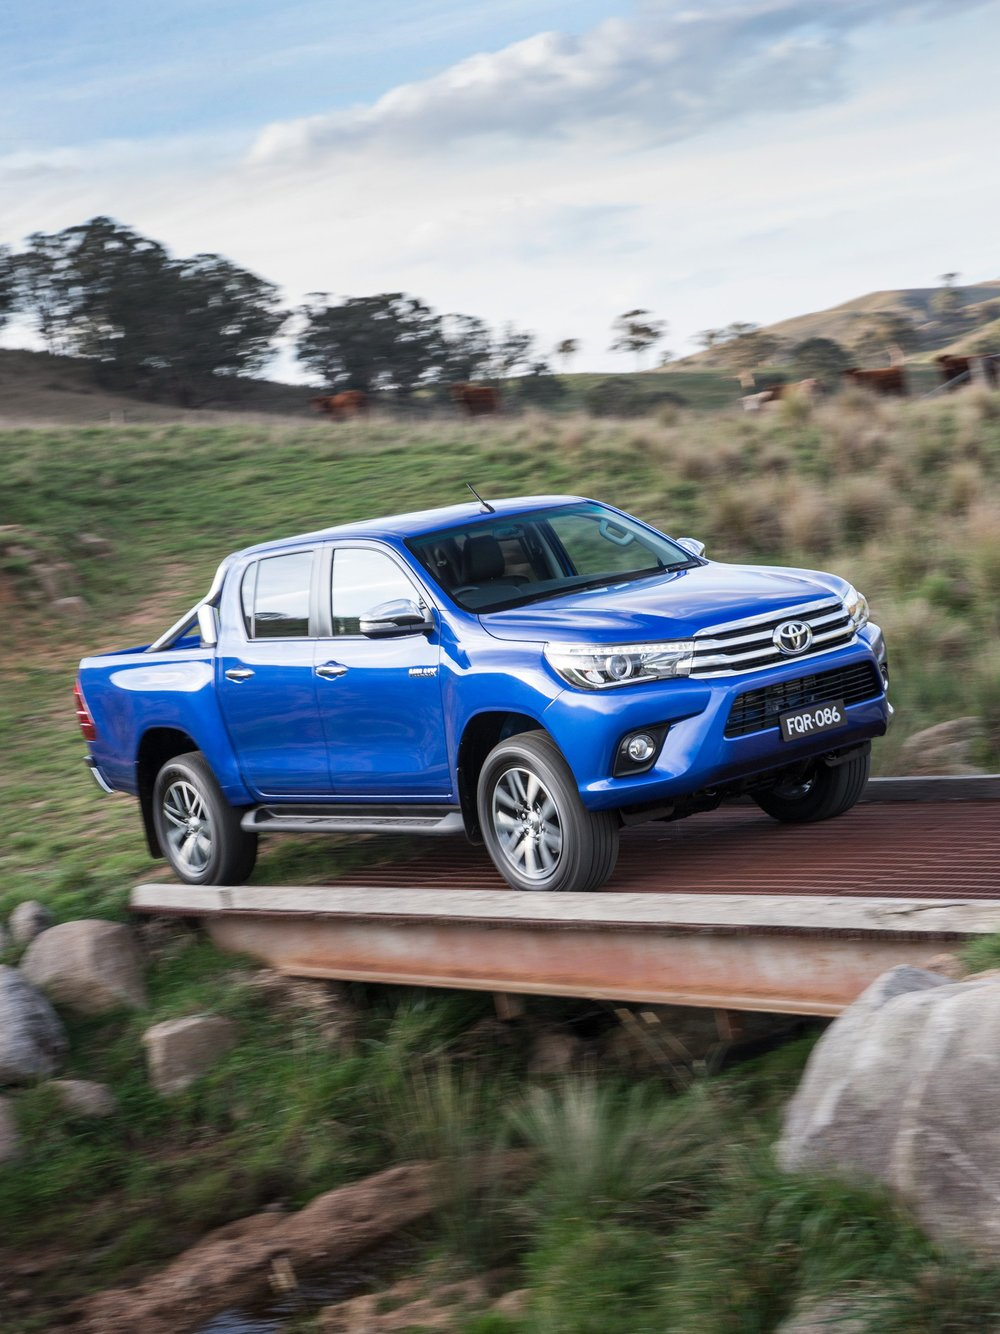 Toyota Hilux Ute 2016 11.jpg